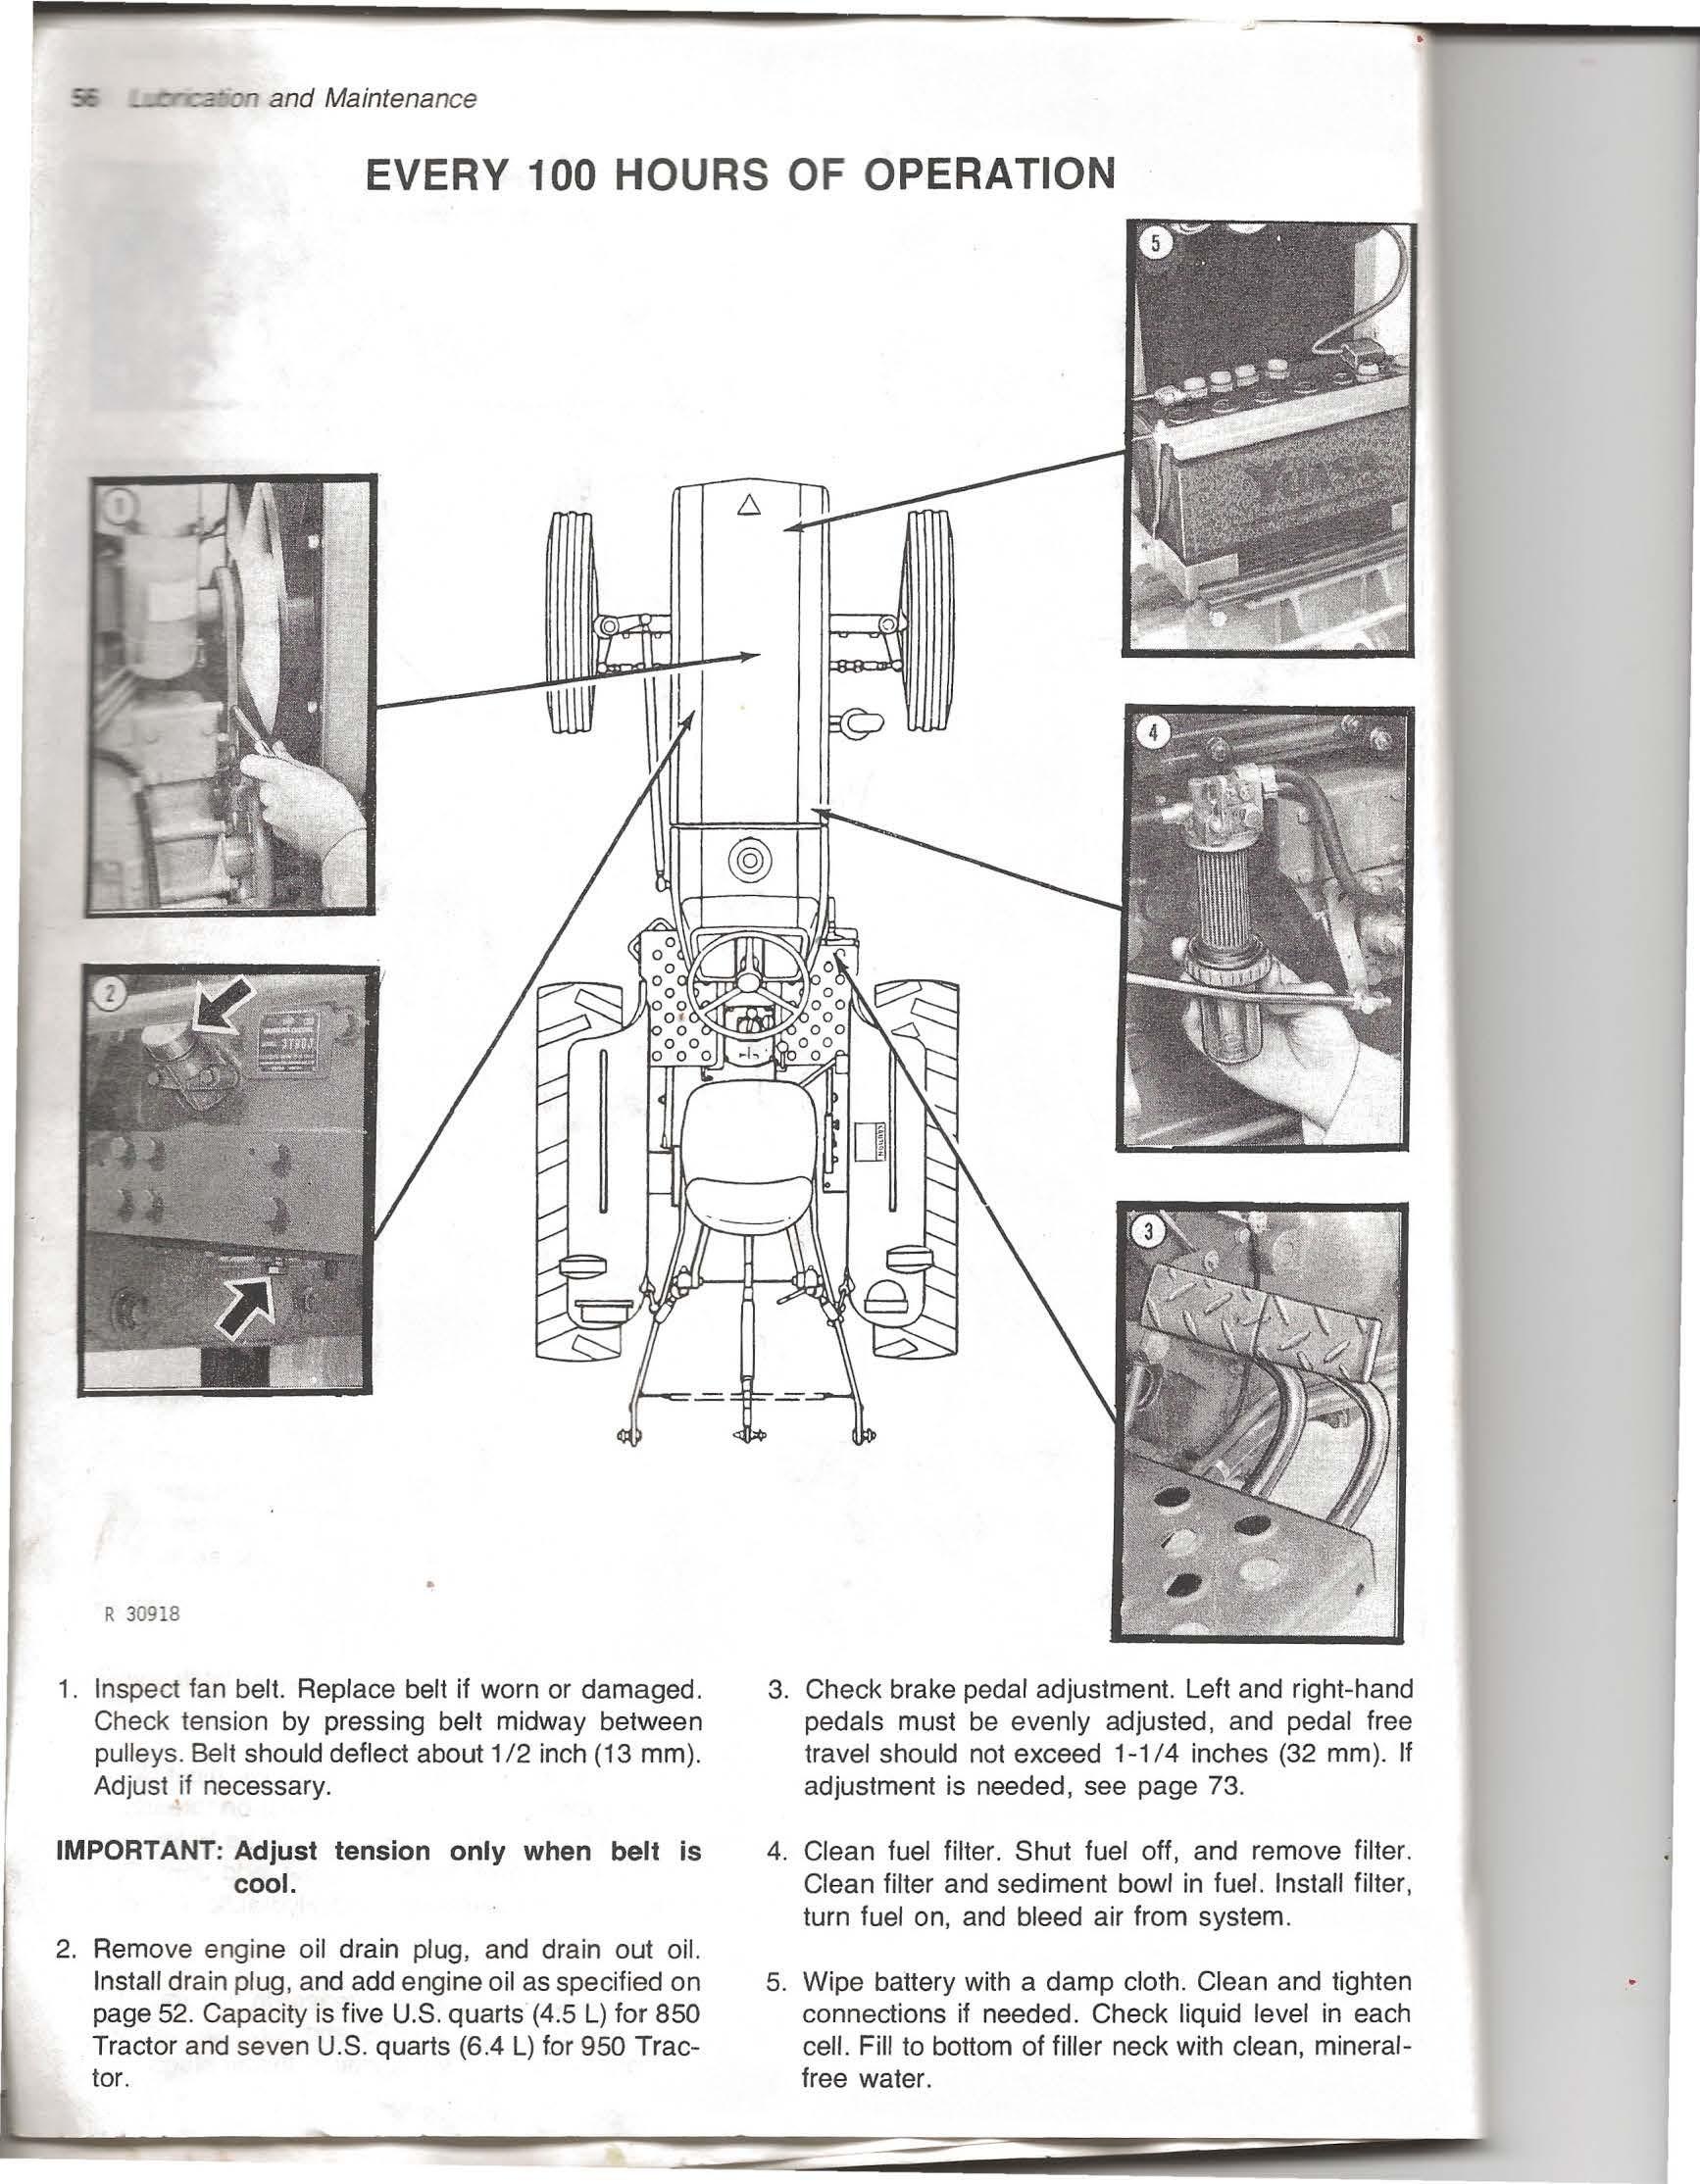 My John Deere 950 Operator's Manual Poudre River Stables. John Deere 850 950 Operator Manual Photos Goodpage58. John Deere. John Deere Ac Filter Diagram At Scoala.co